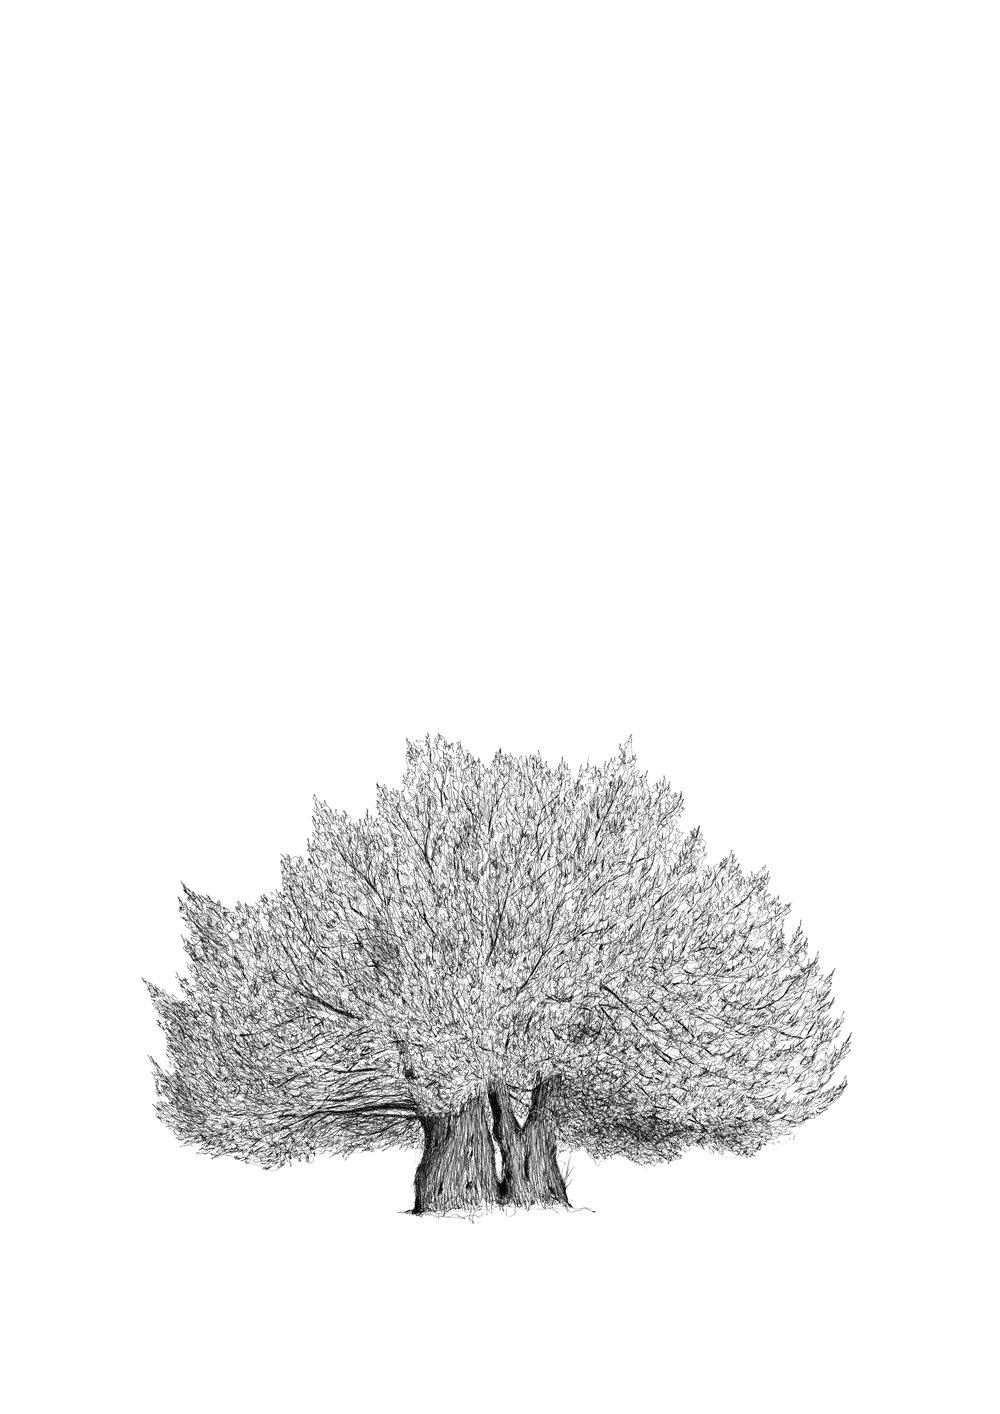 THE DARWIN TREE FOR PRINT - Luke Adam Hawker- low res.jpg